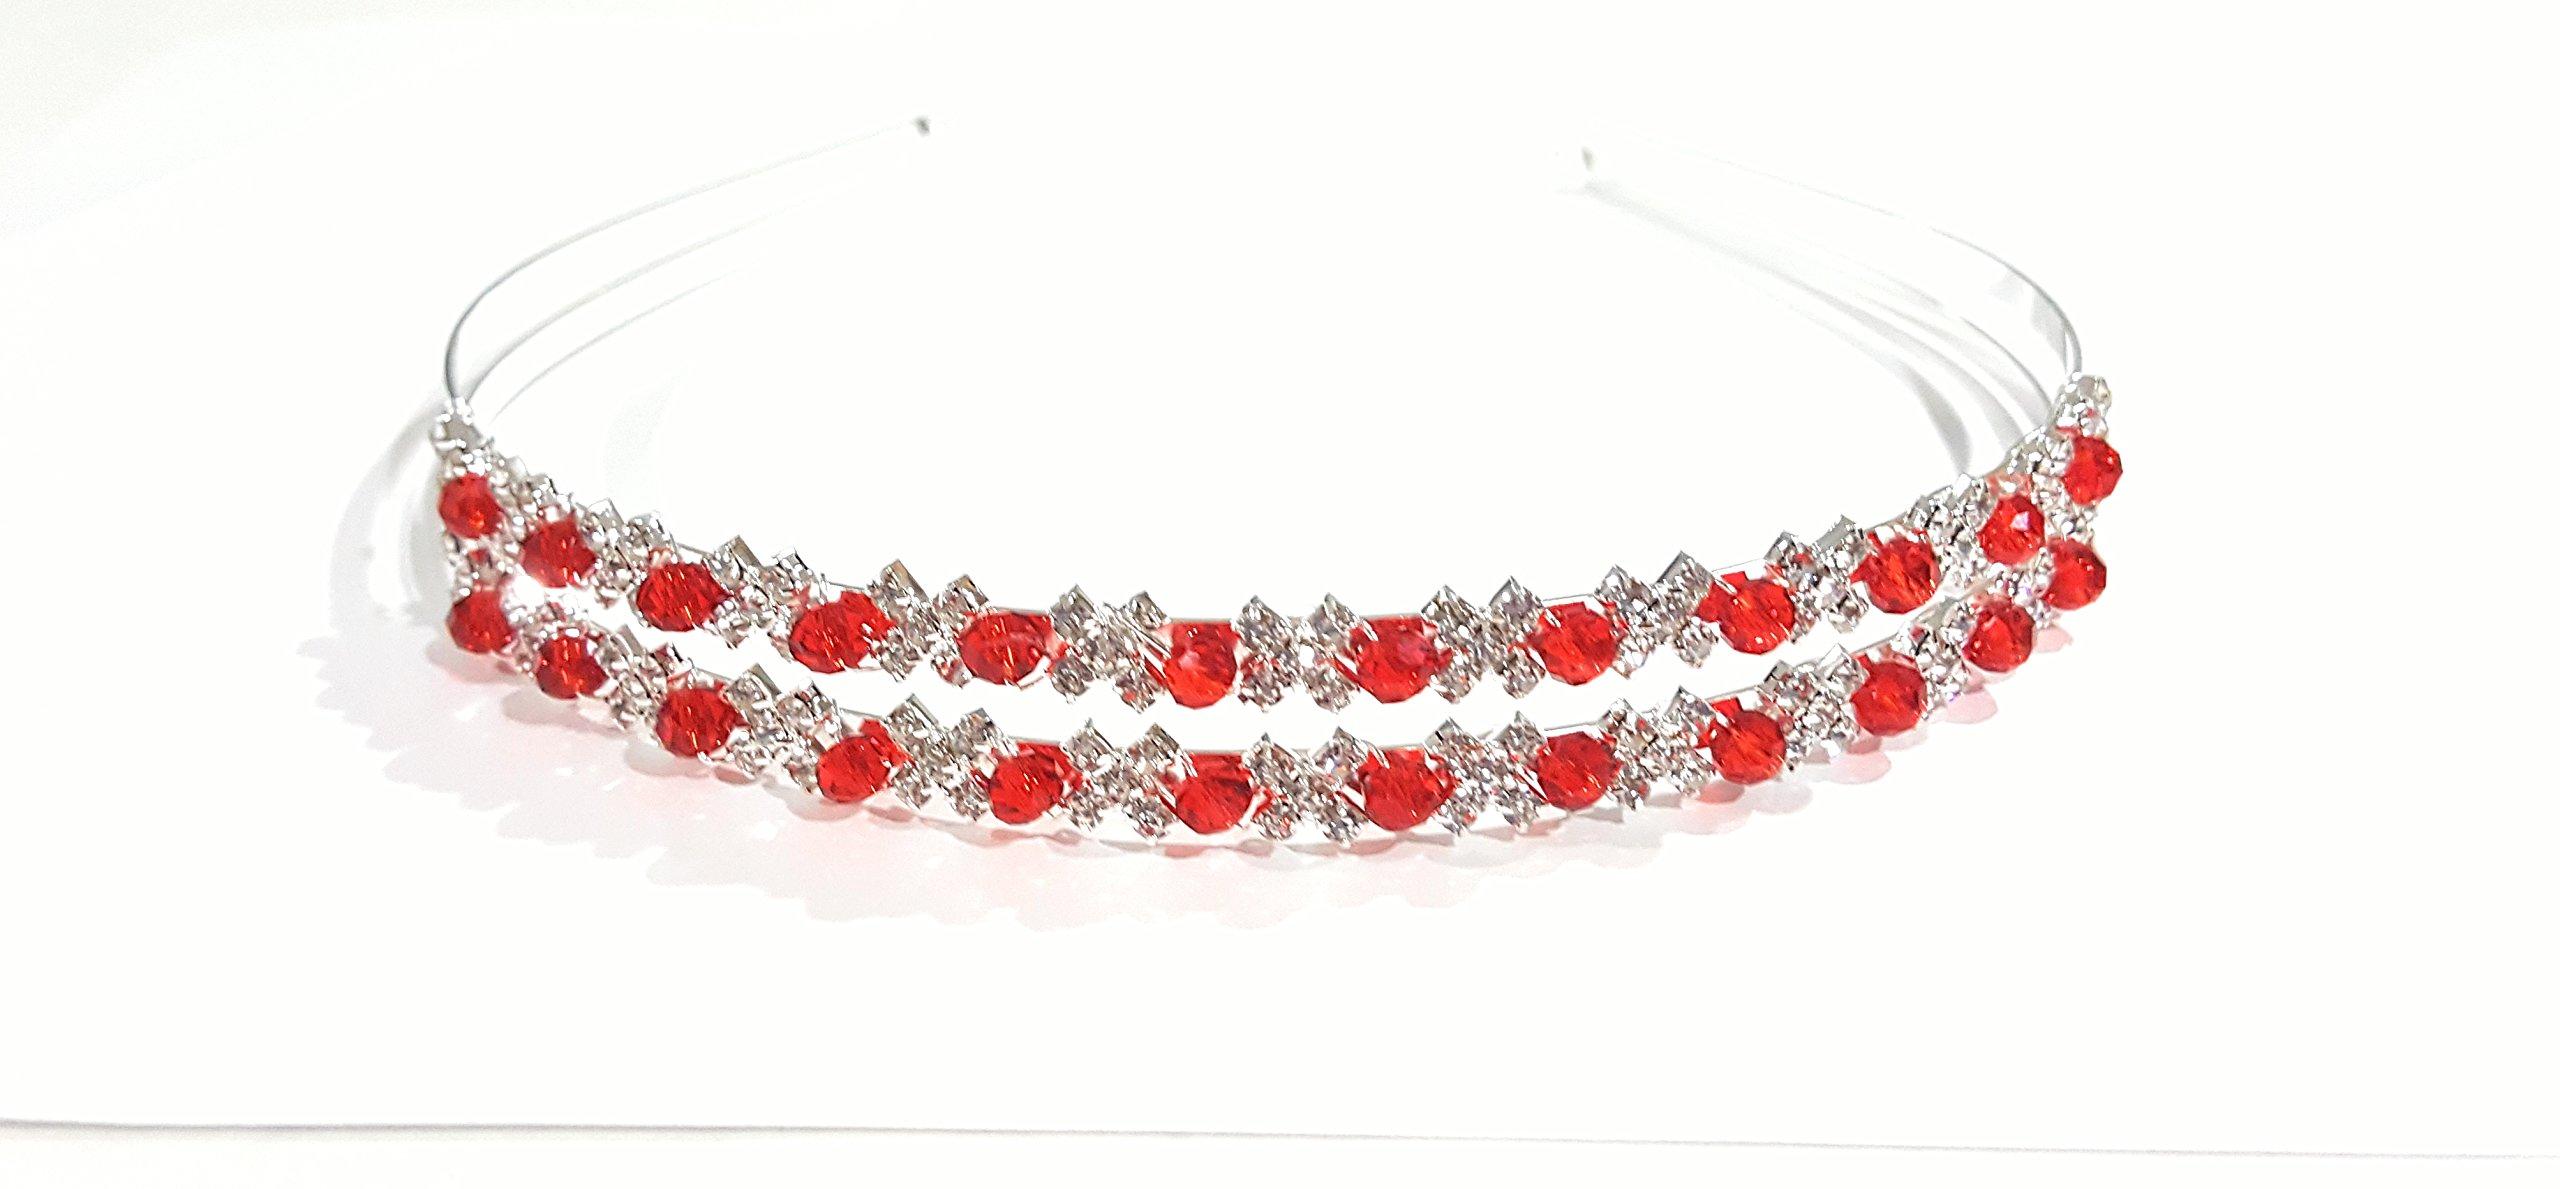 Shop Ginger Wedding Double Band Rhinestone Communion Tiara Headband Bridal Bridesmaid (Ruby Red, Silver Plated)